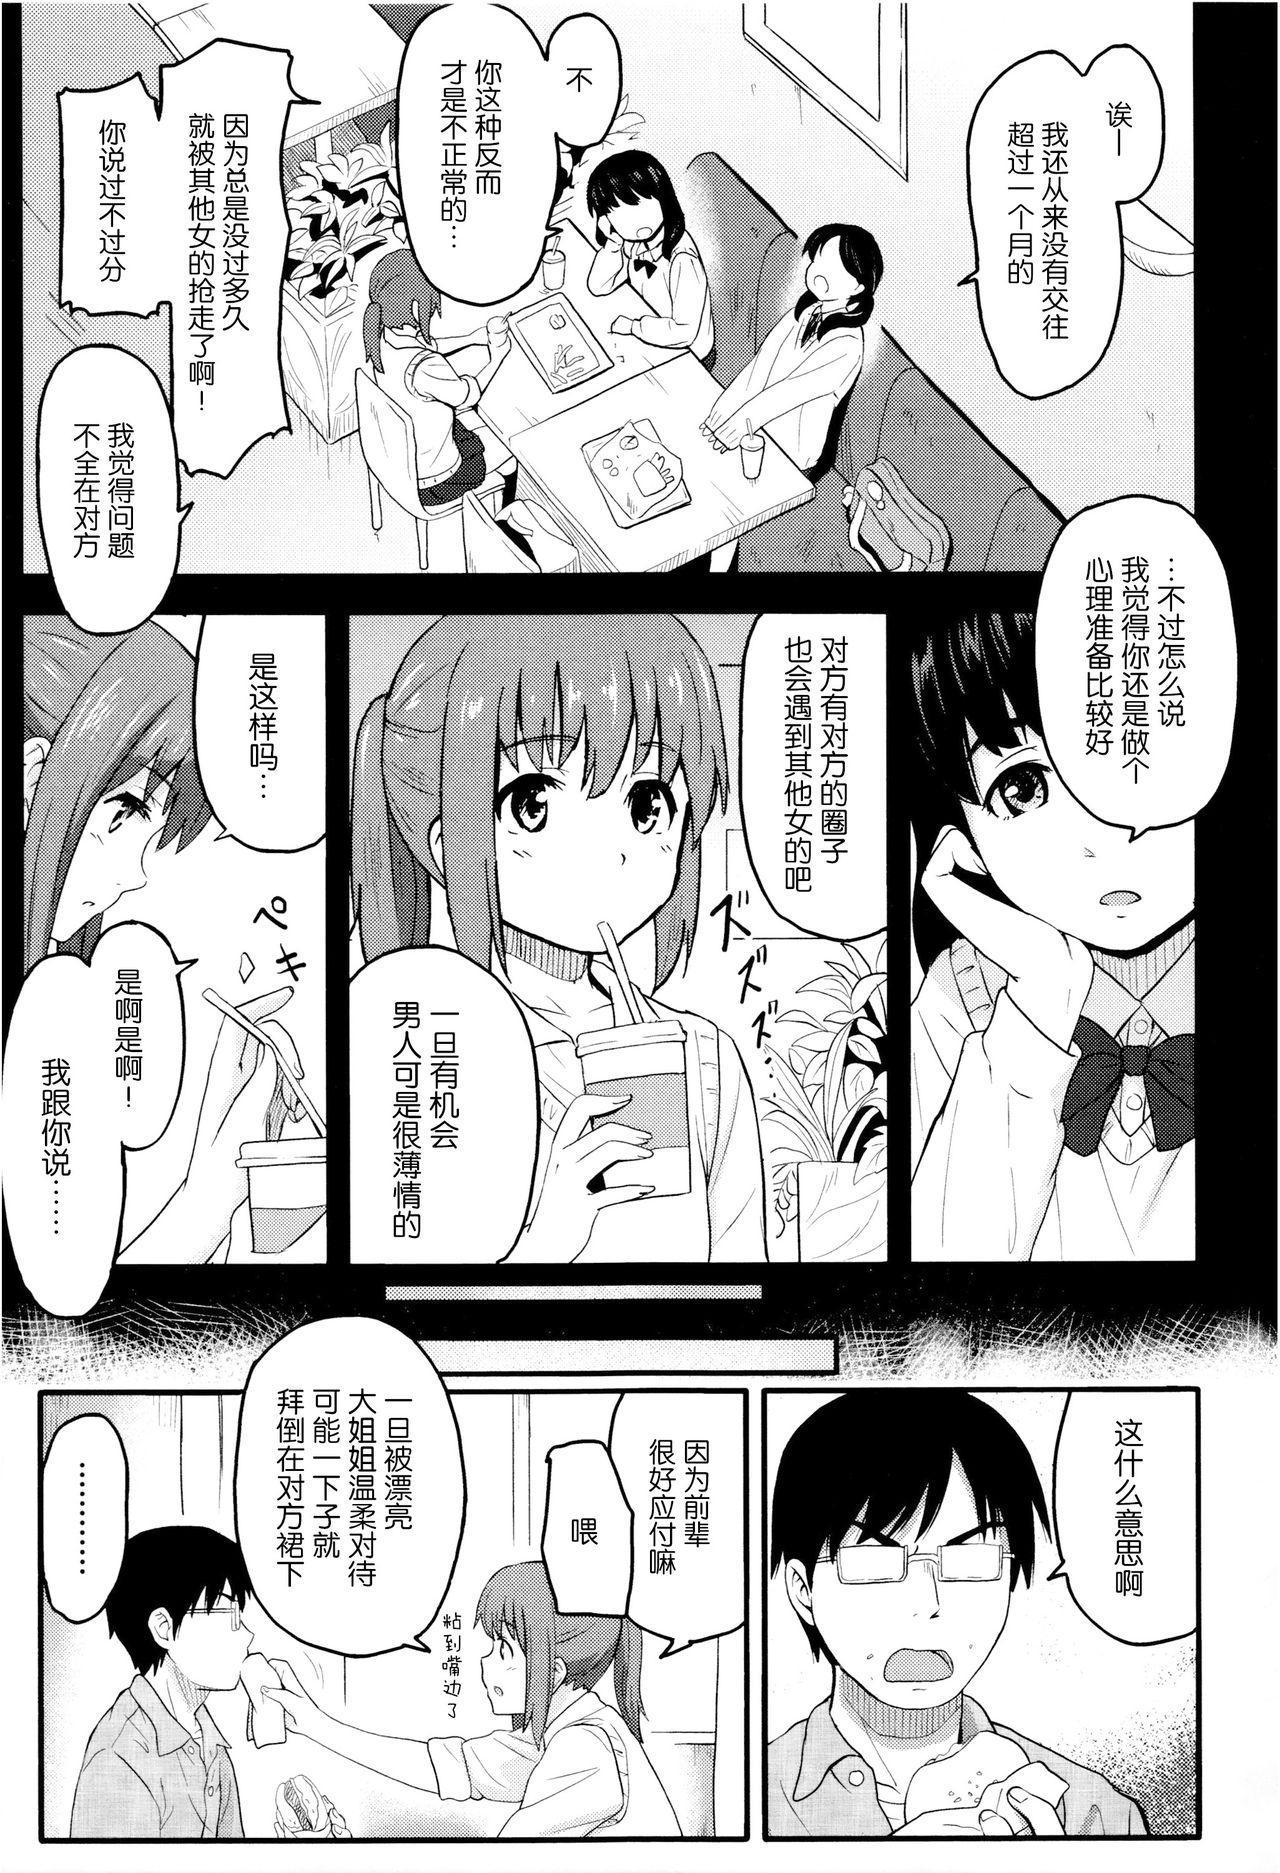 Tokubetsu na Mainichi - Special daily 145